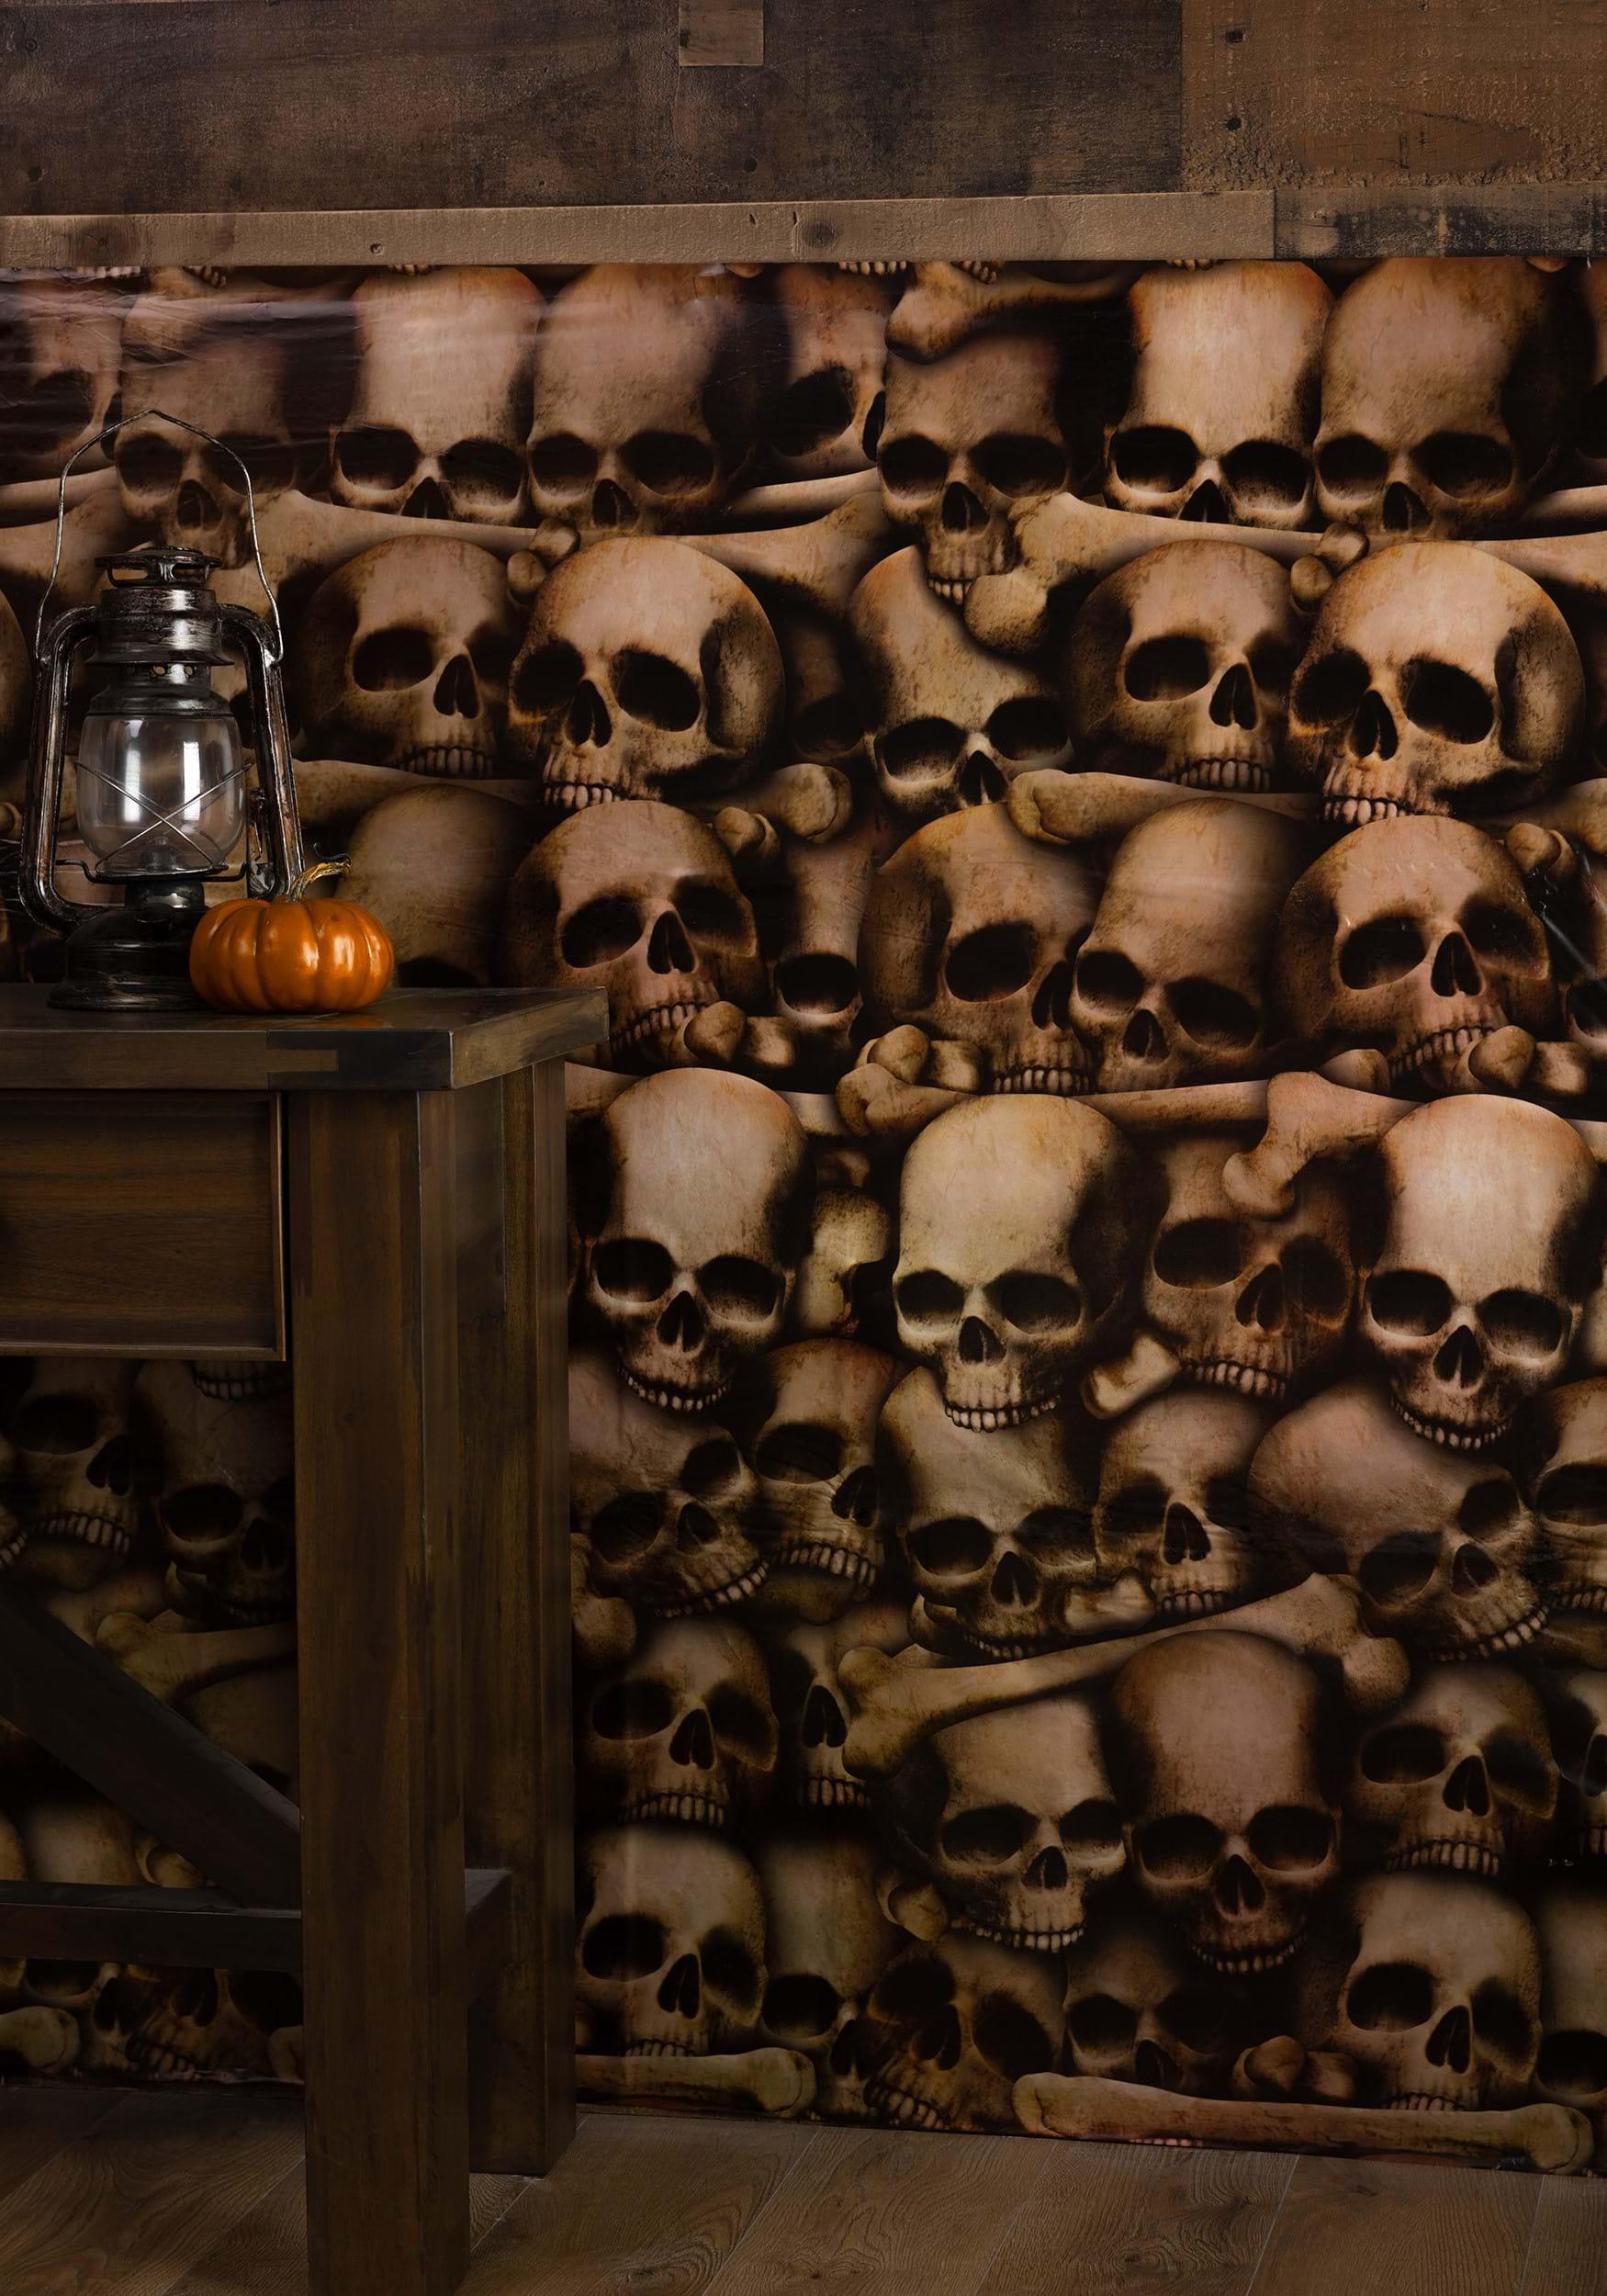 Backdrop_Wall_of_Skulls_Catacombs_Halloween_Decoration